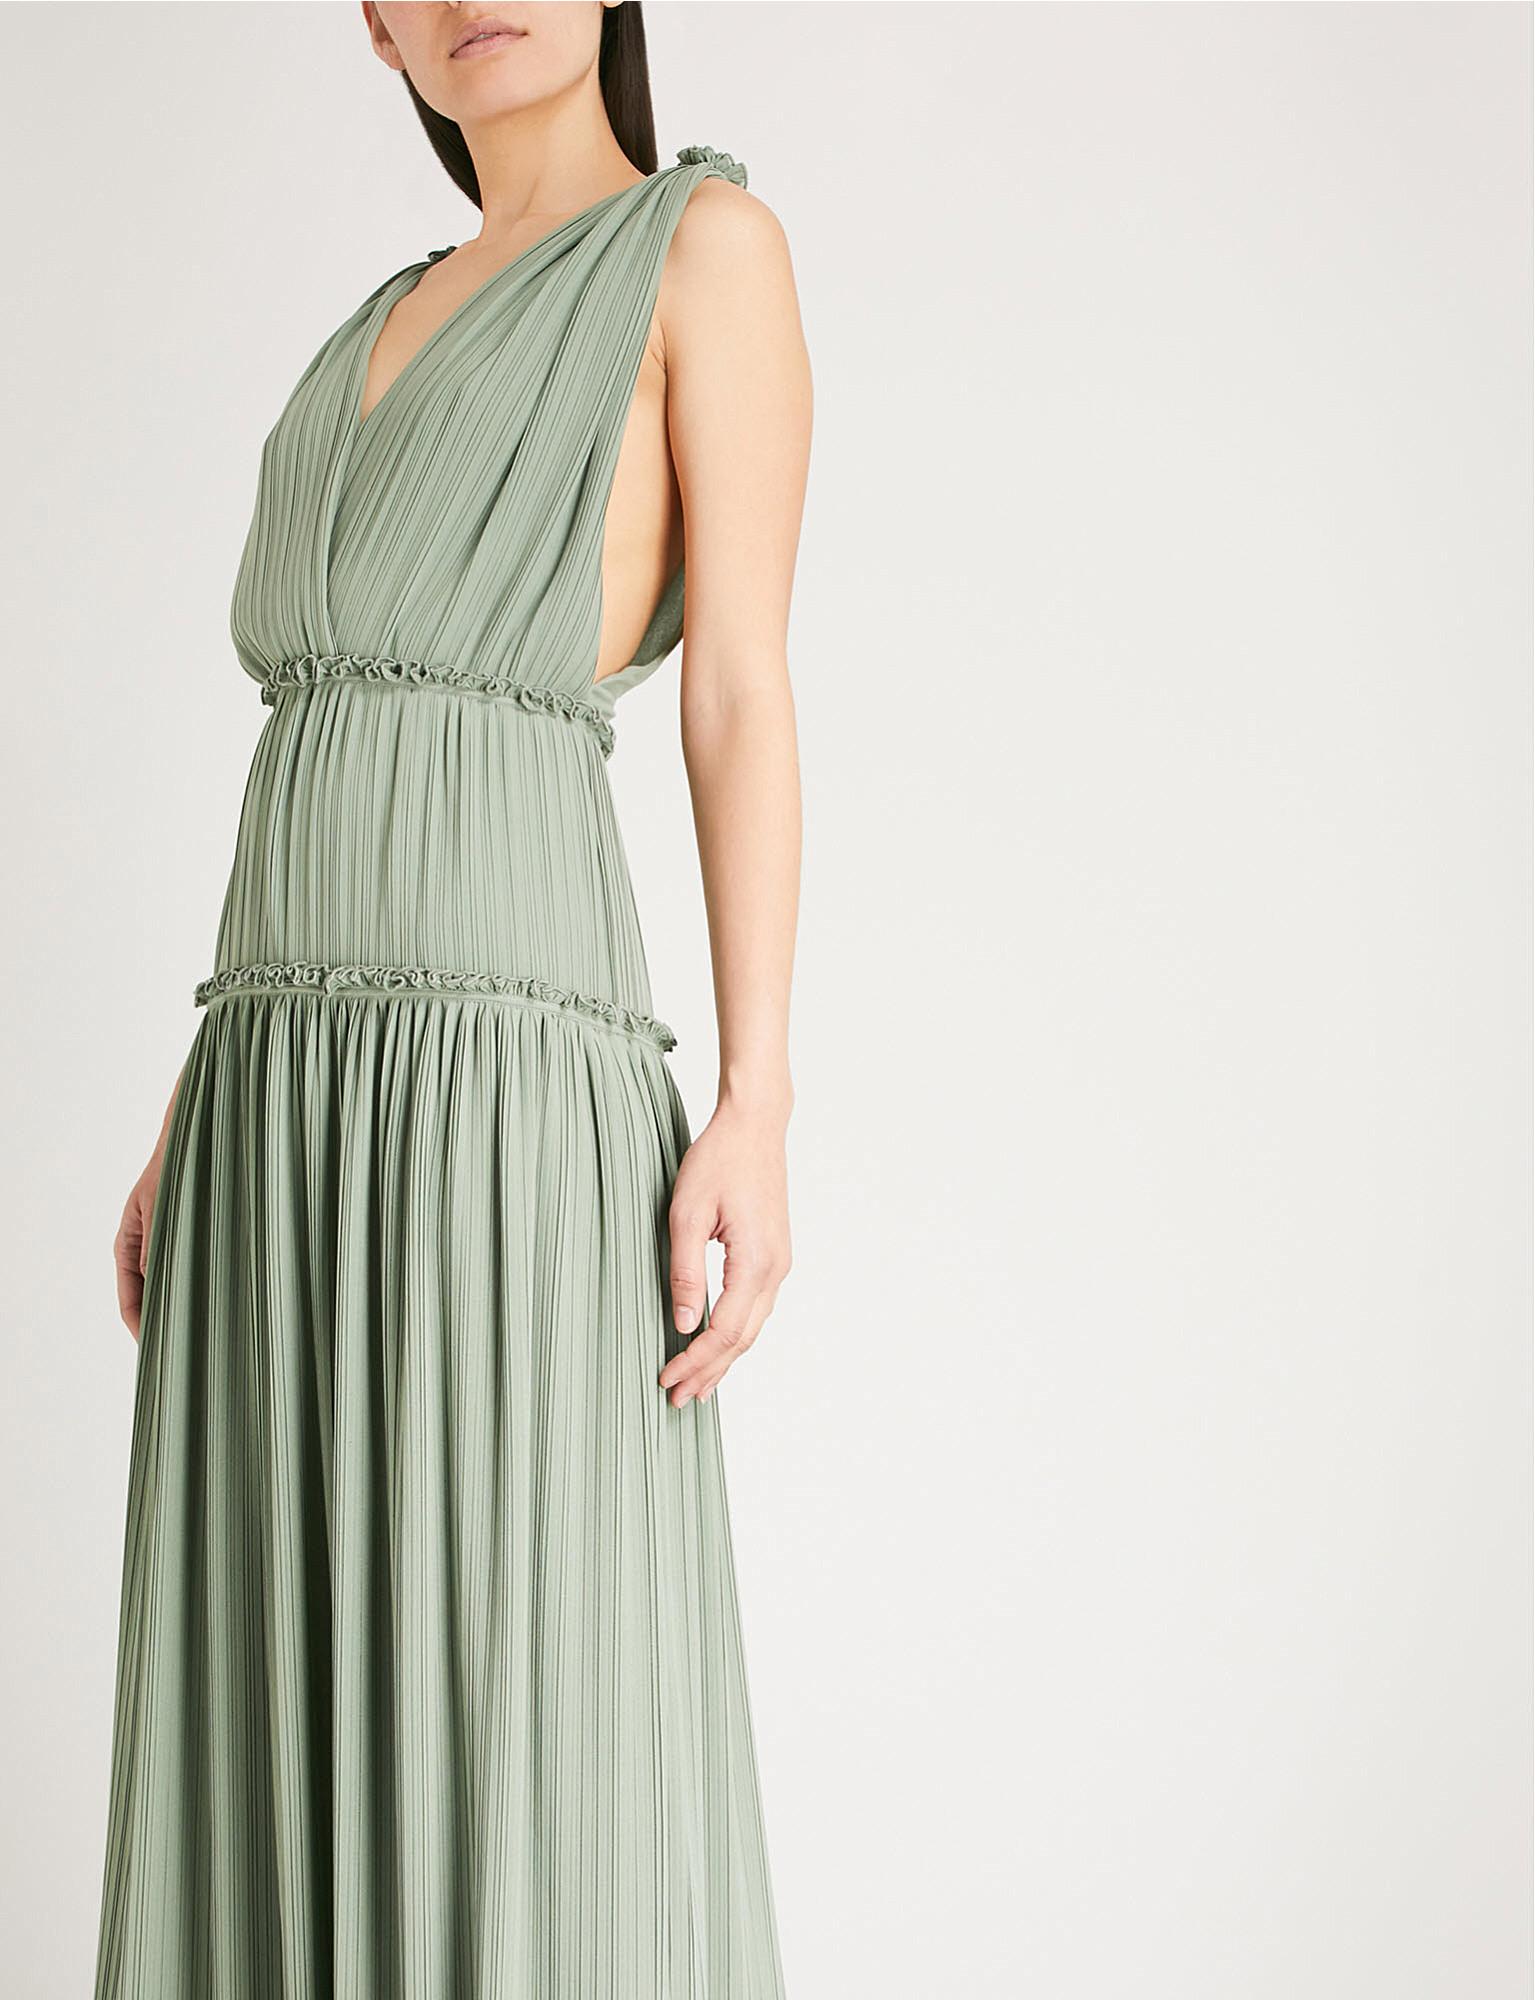 6dde5c75516 ... Gigi pleated chiffon maxi dress zoom ...